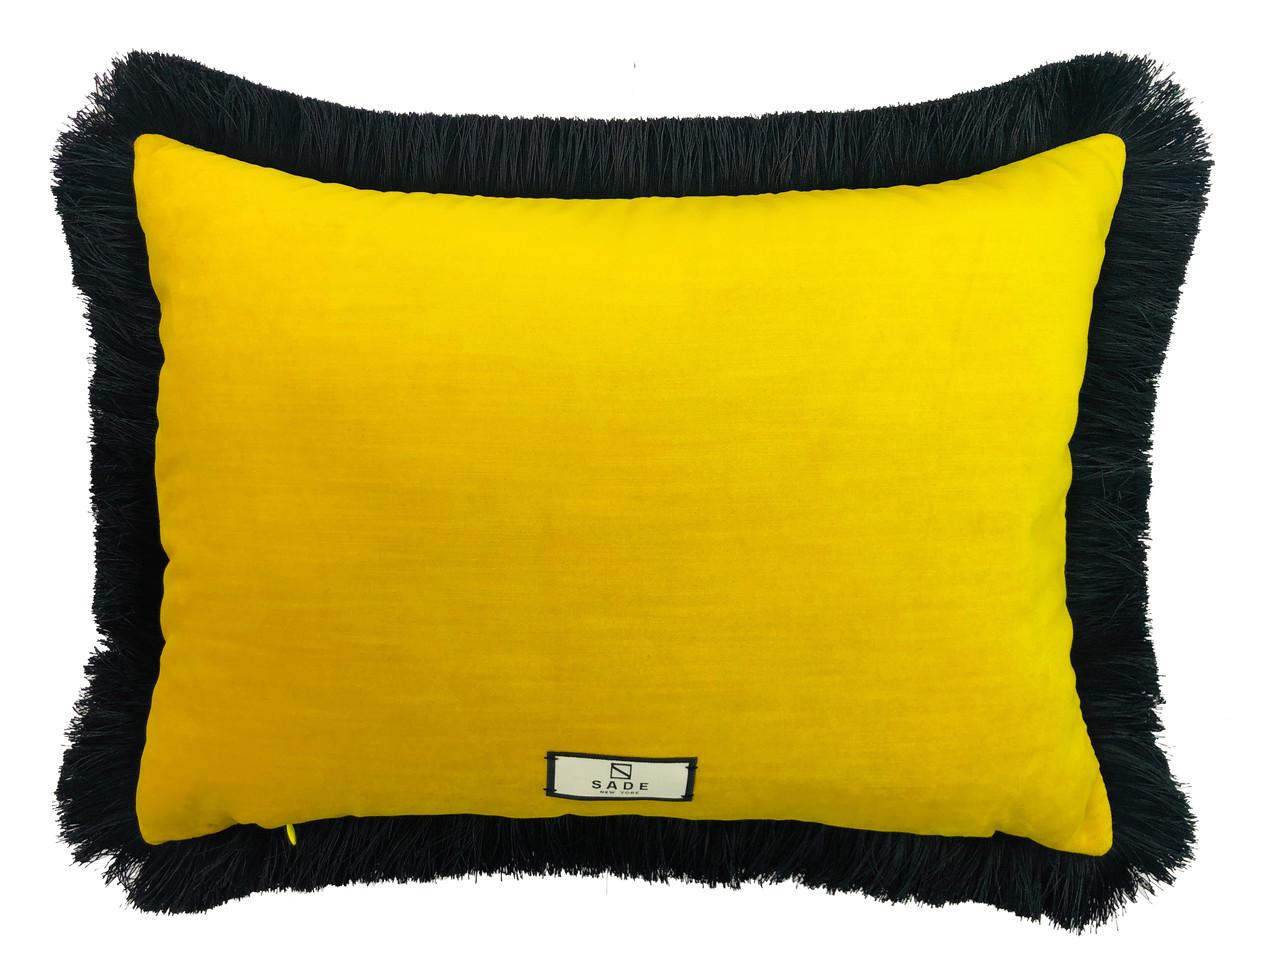 velvet lumbar tiger embroidery design pillow